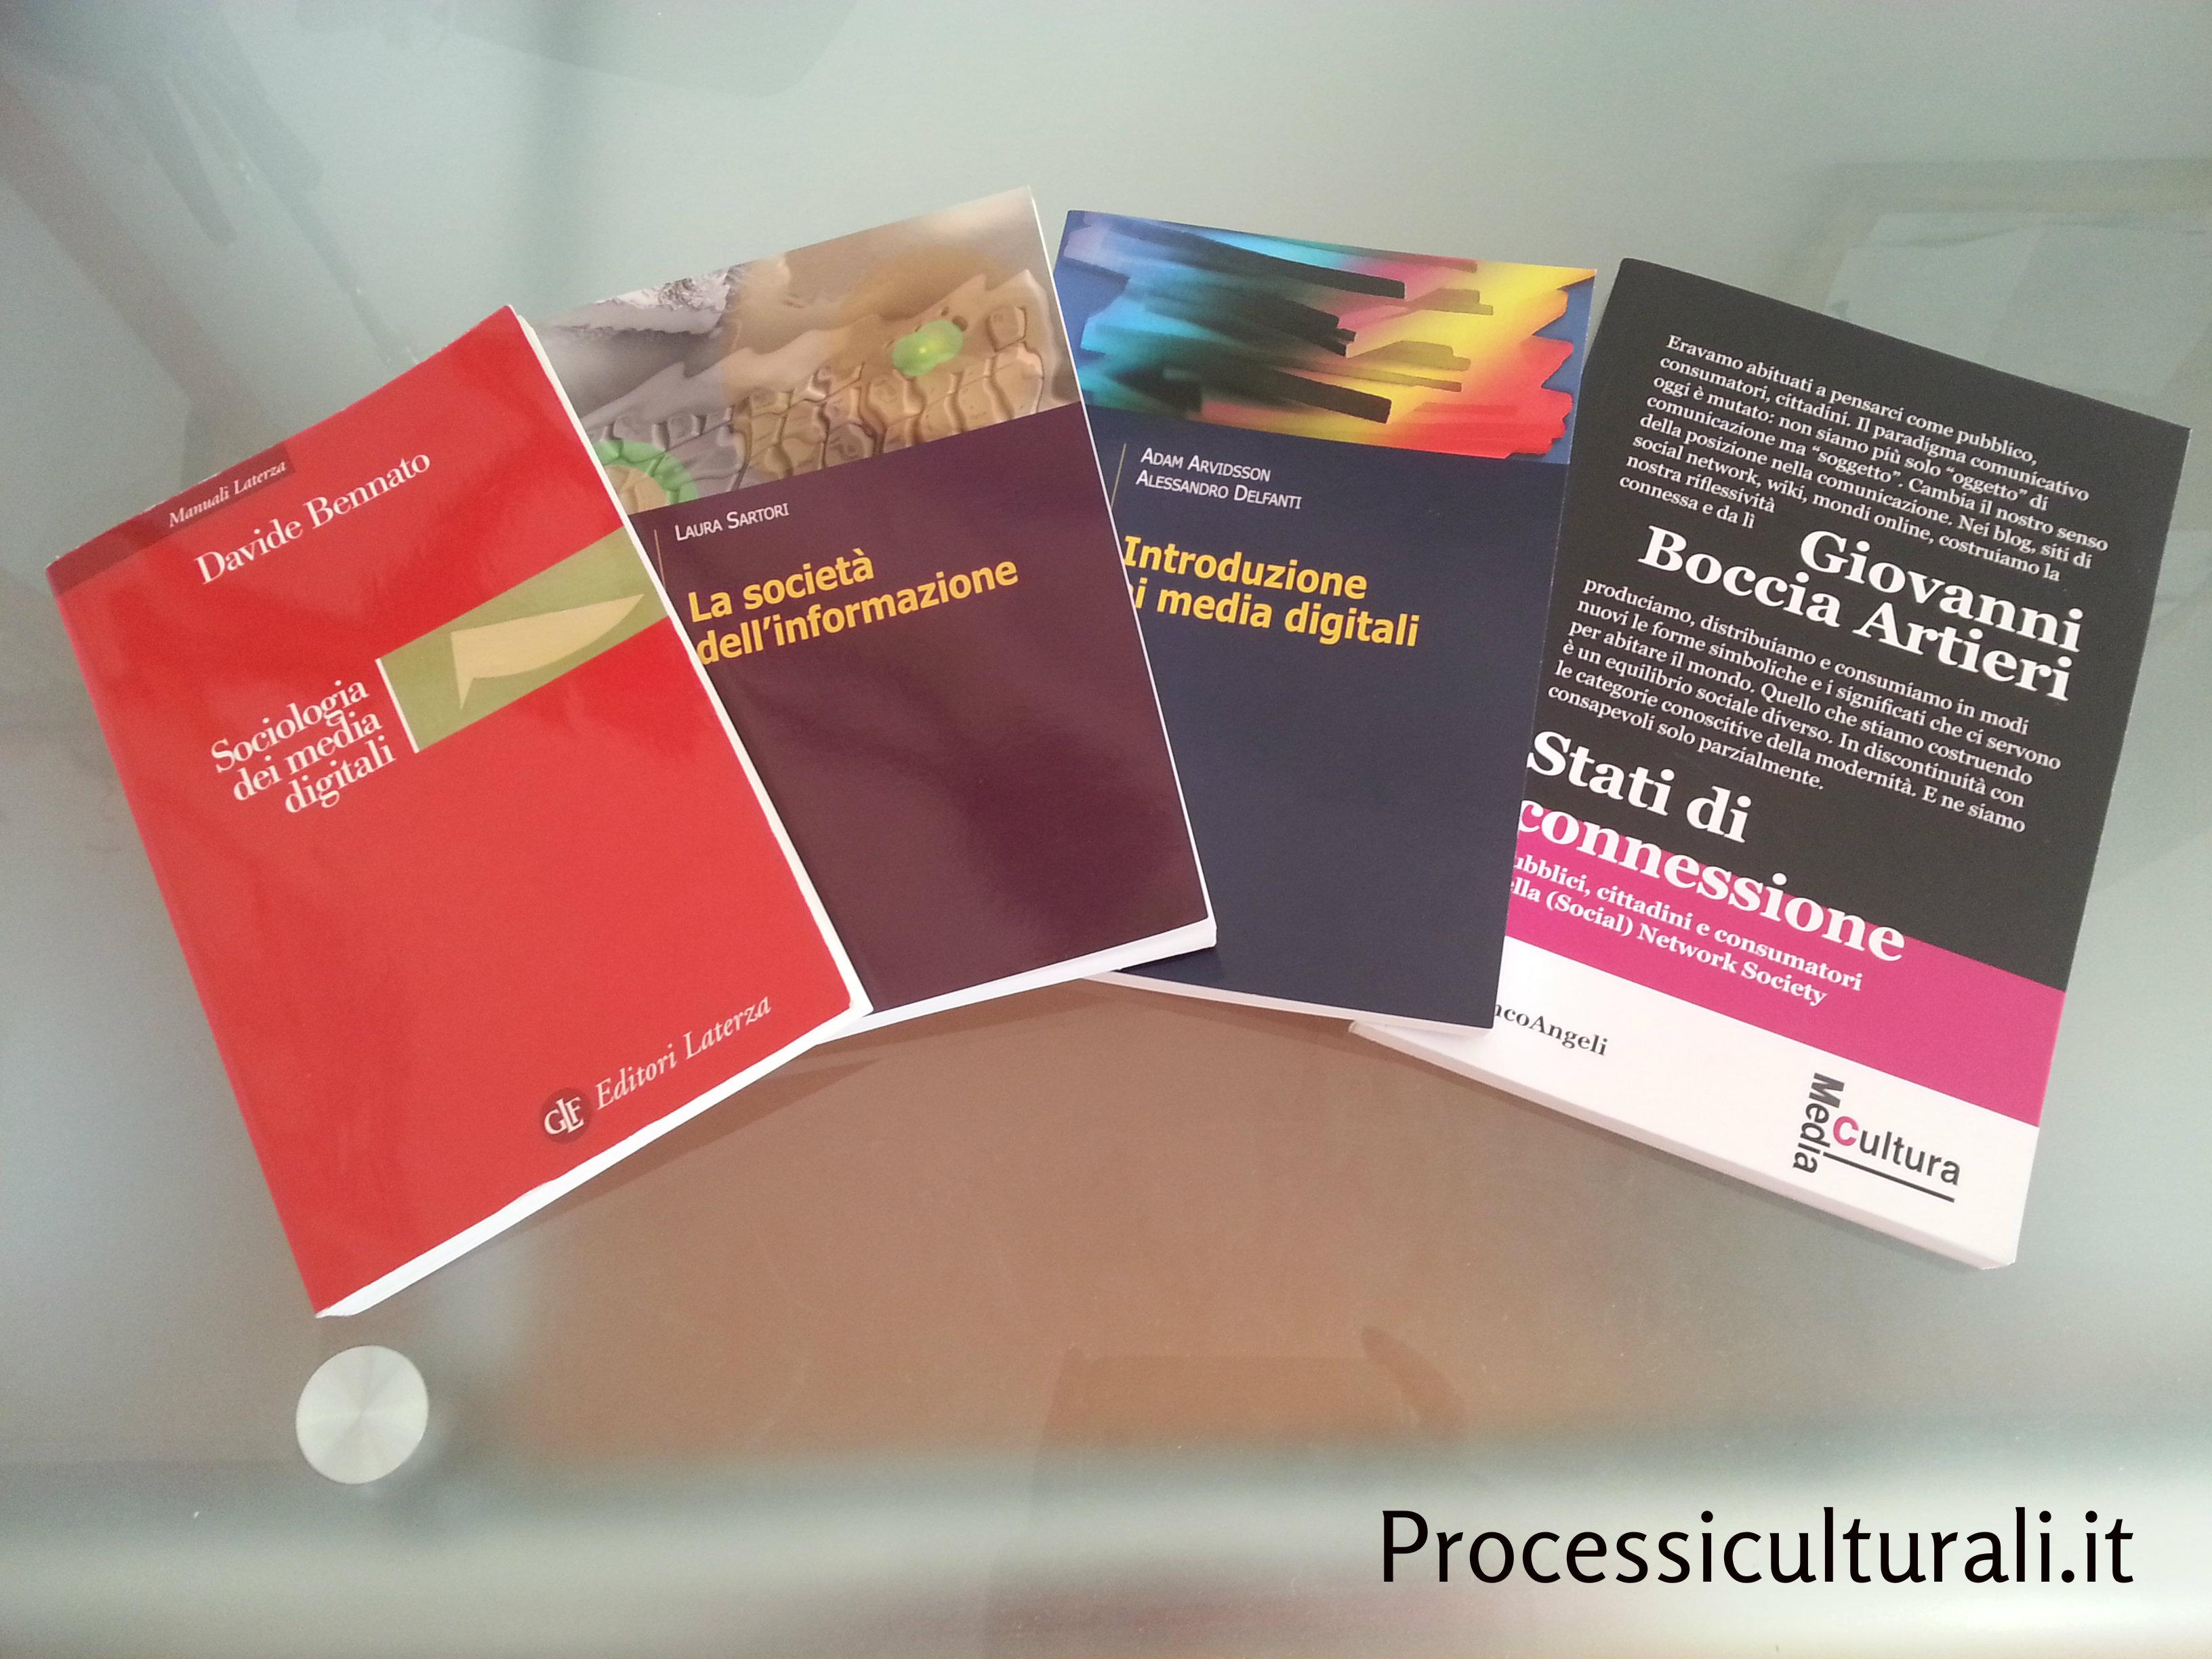 2013-10-13_Processiculturali-programma-2013-14